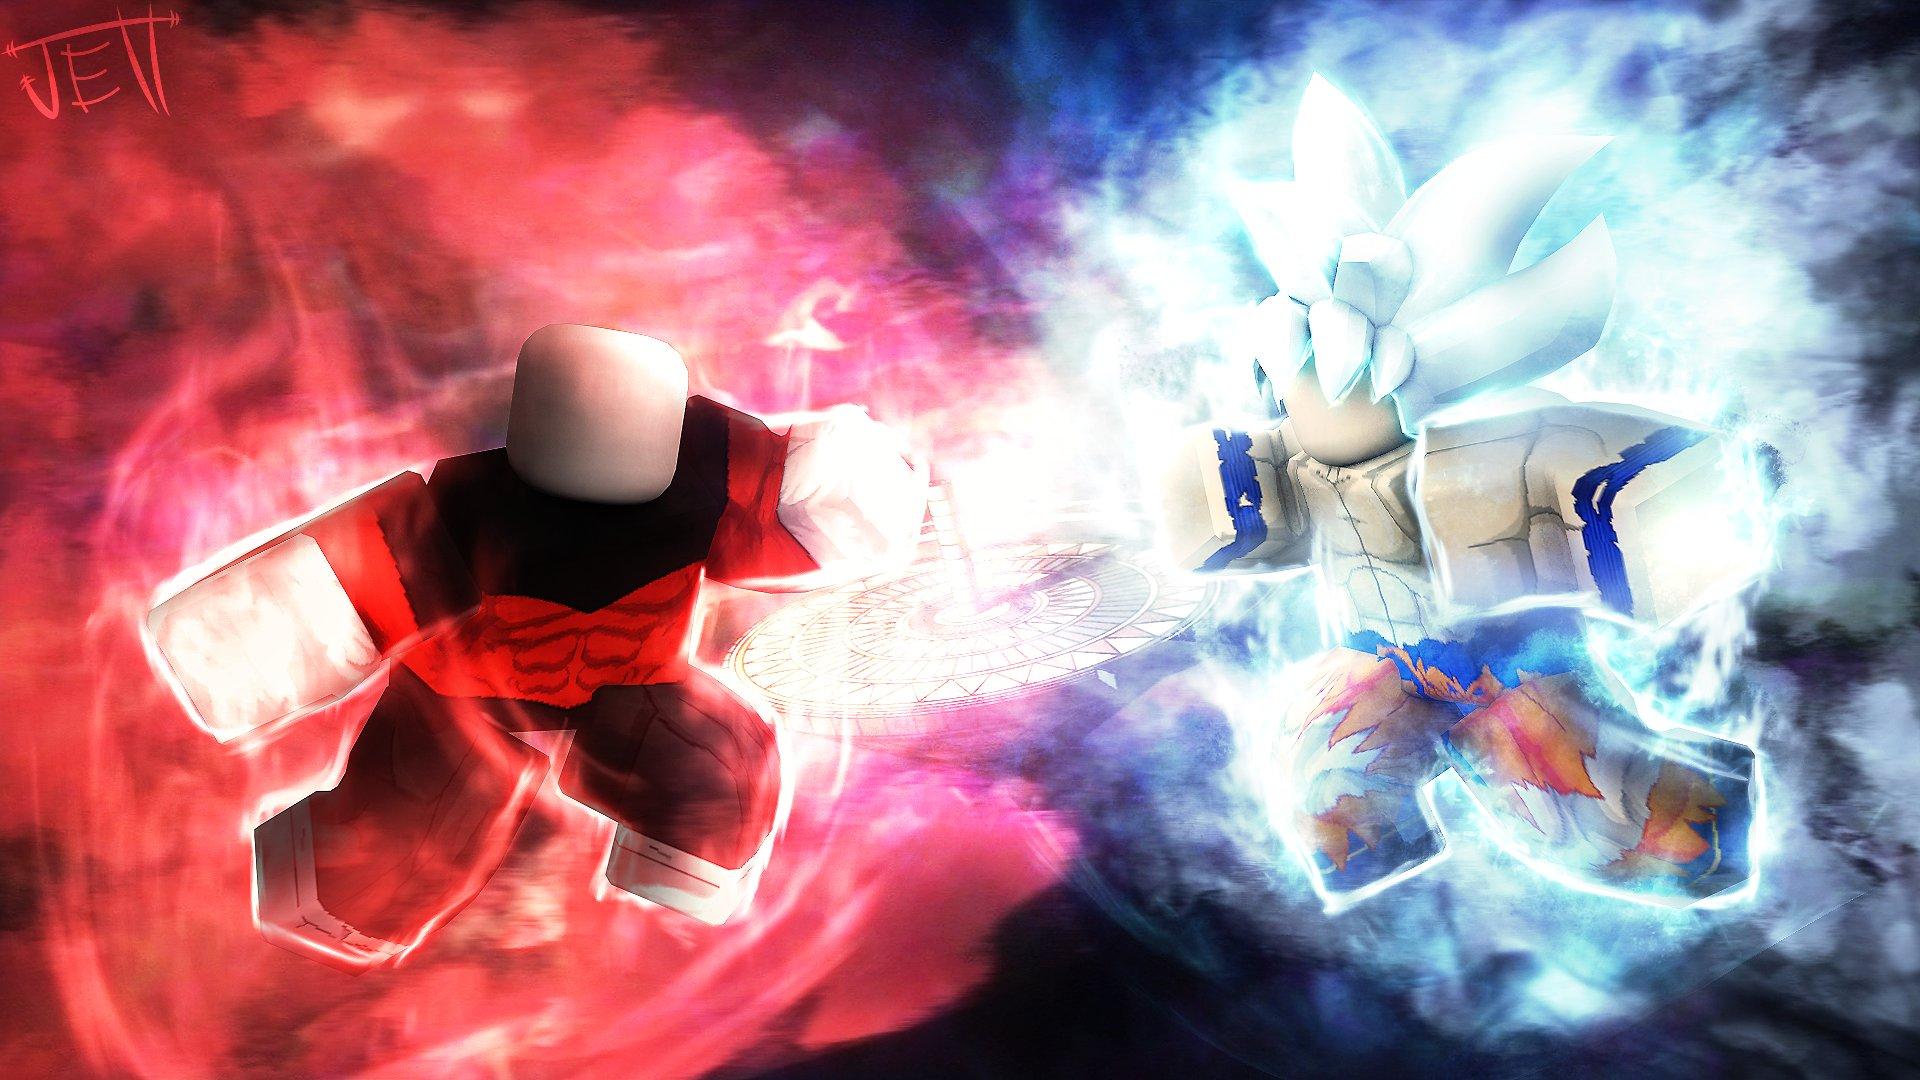 Goku Vs Jiren Roblox Je Tt On Twitter Jiren Vs Goku Mastered Ultra Instinct Robloxdev Roblox Robloxart Robloxgfx Rbxdev